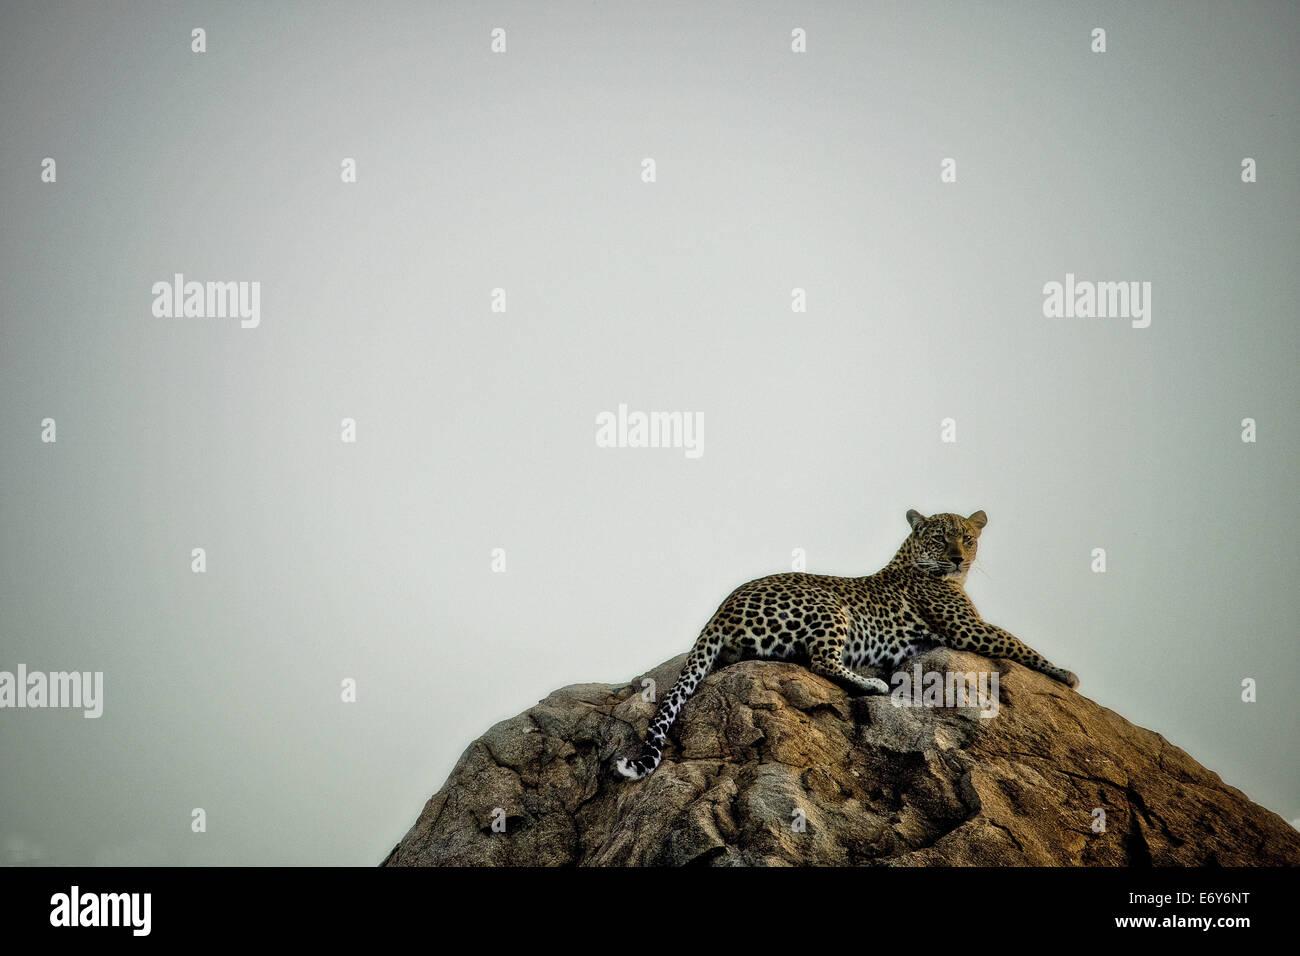 Leopard, liegend auf einem Felsen, Sabi Sands Game Reserve, Südafrika, Afrika Stockbild